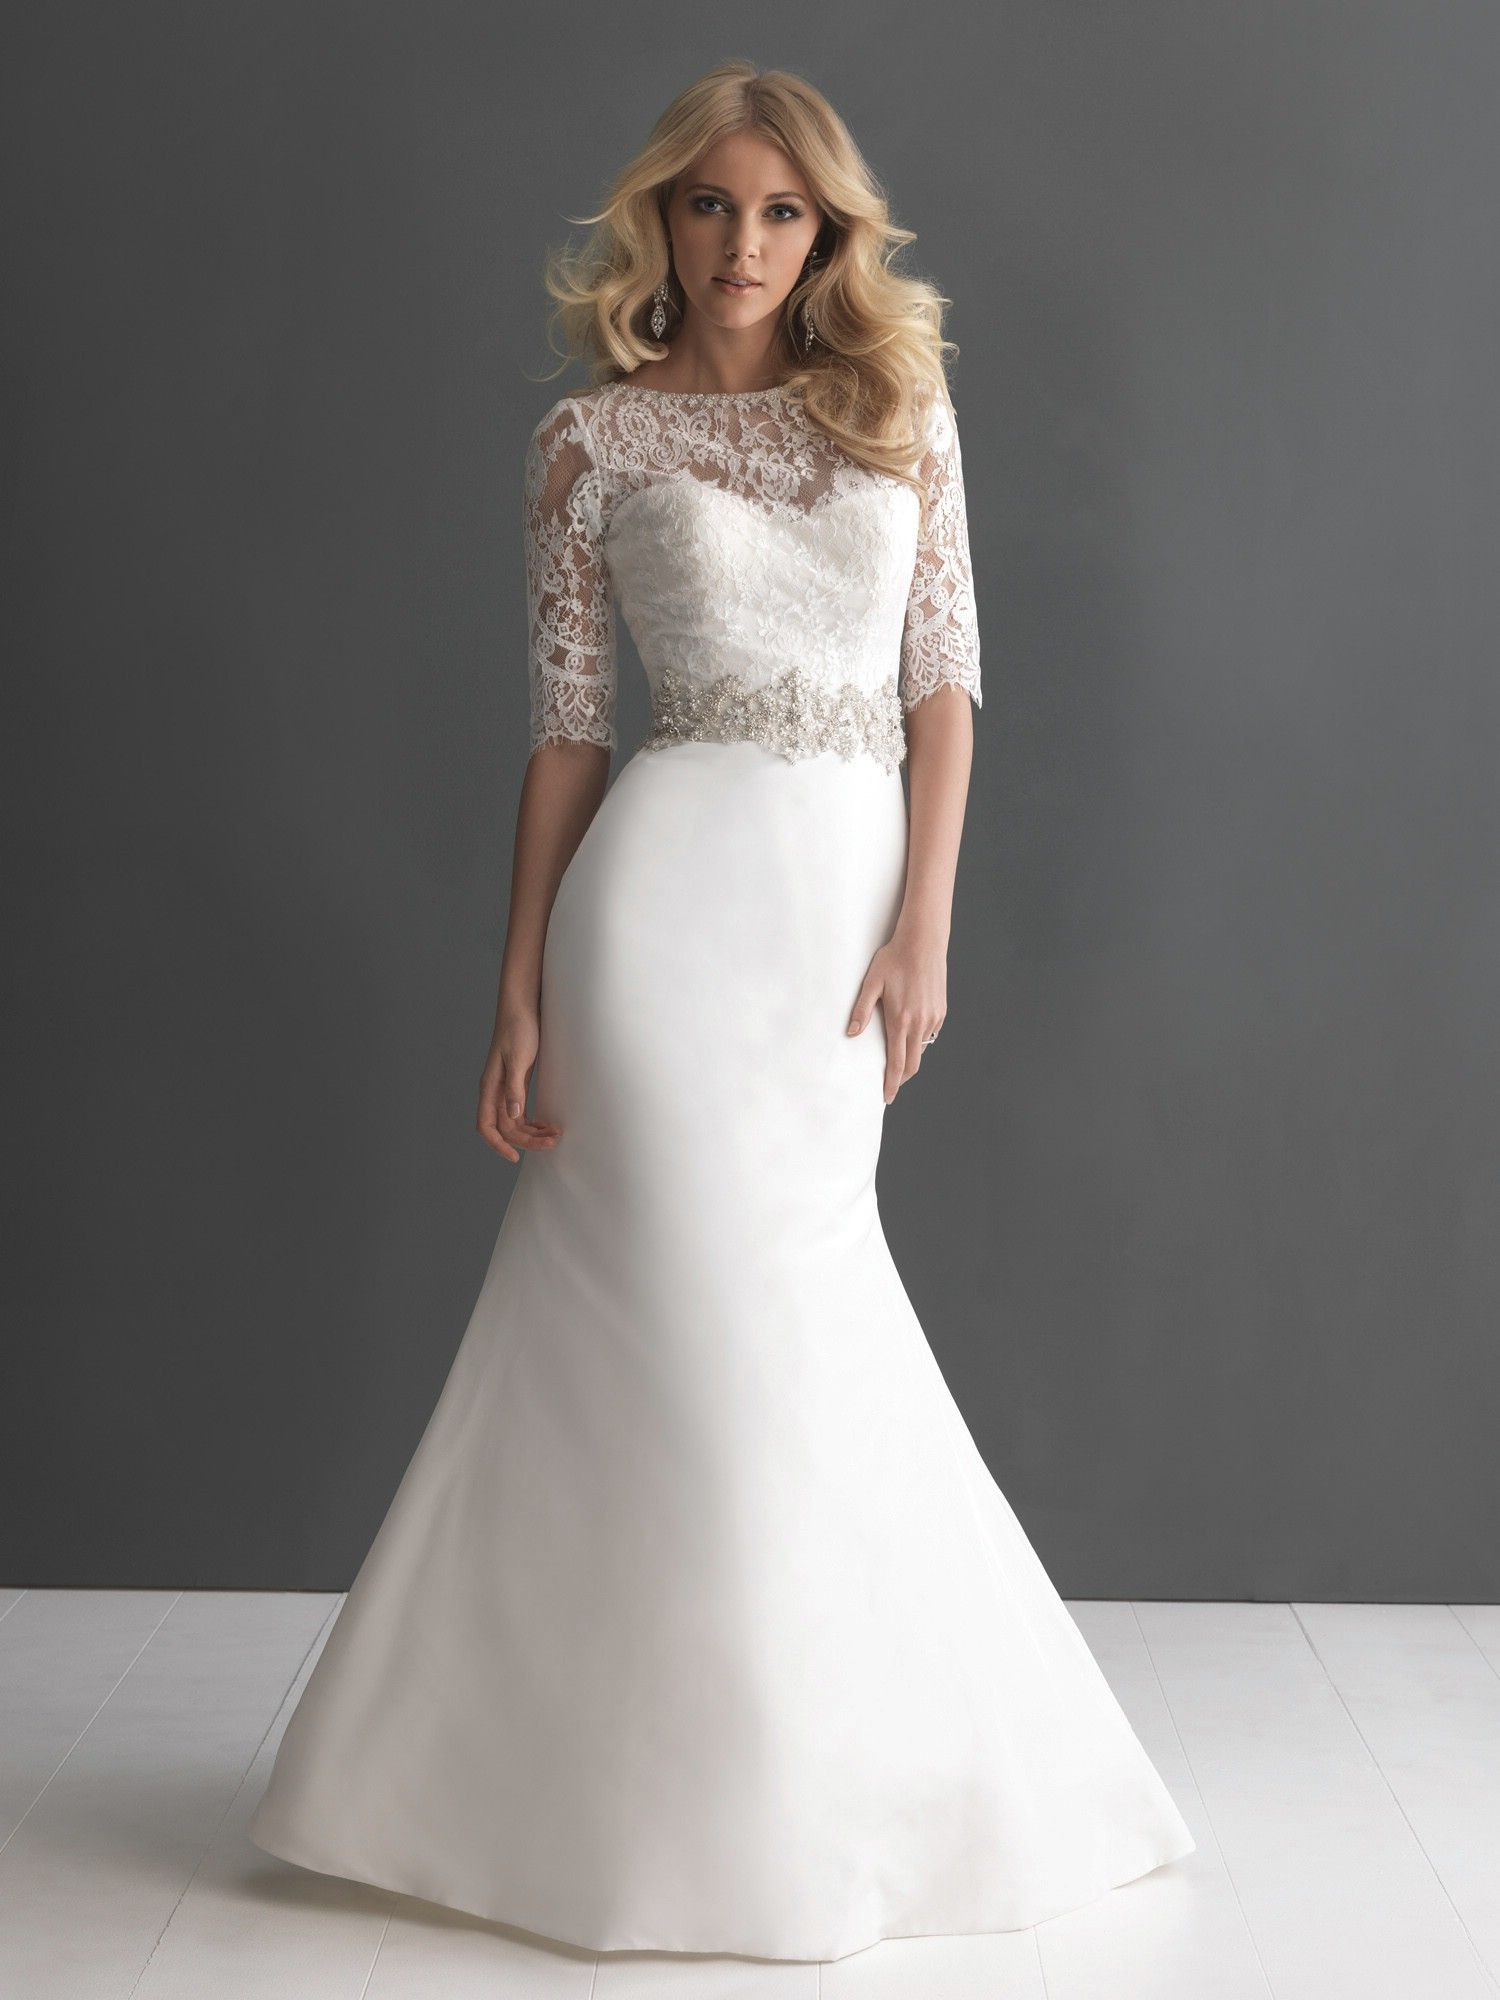 Allure romance wedding dresses style allure wedding